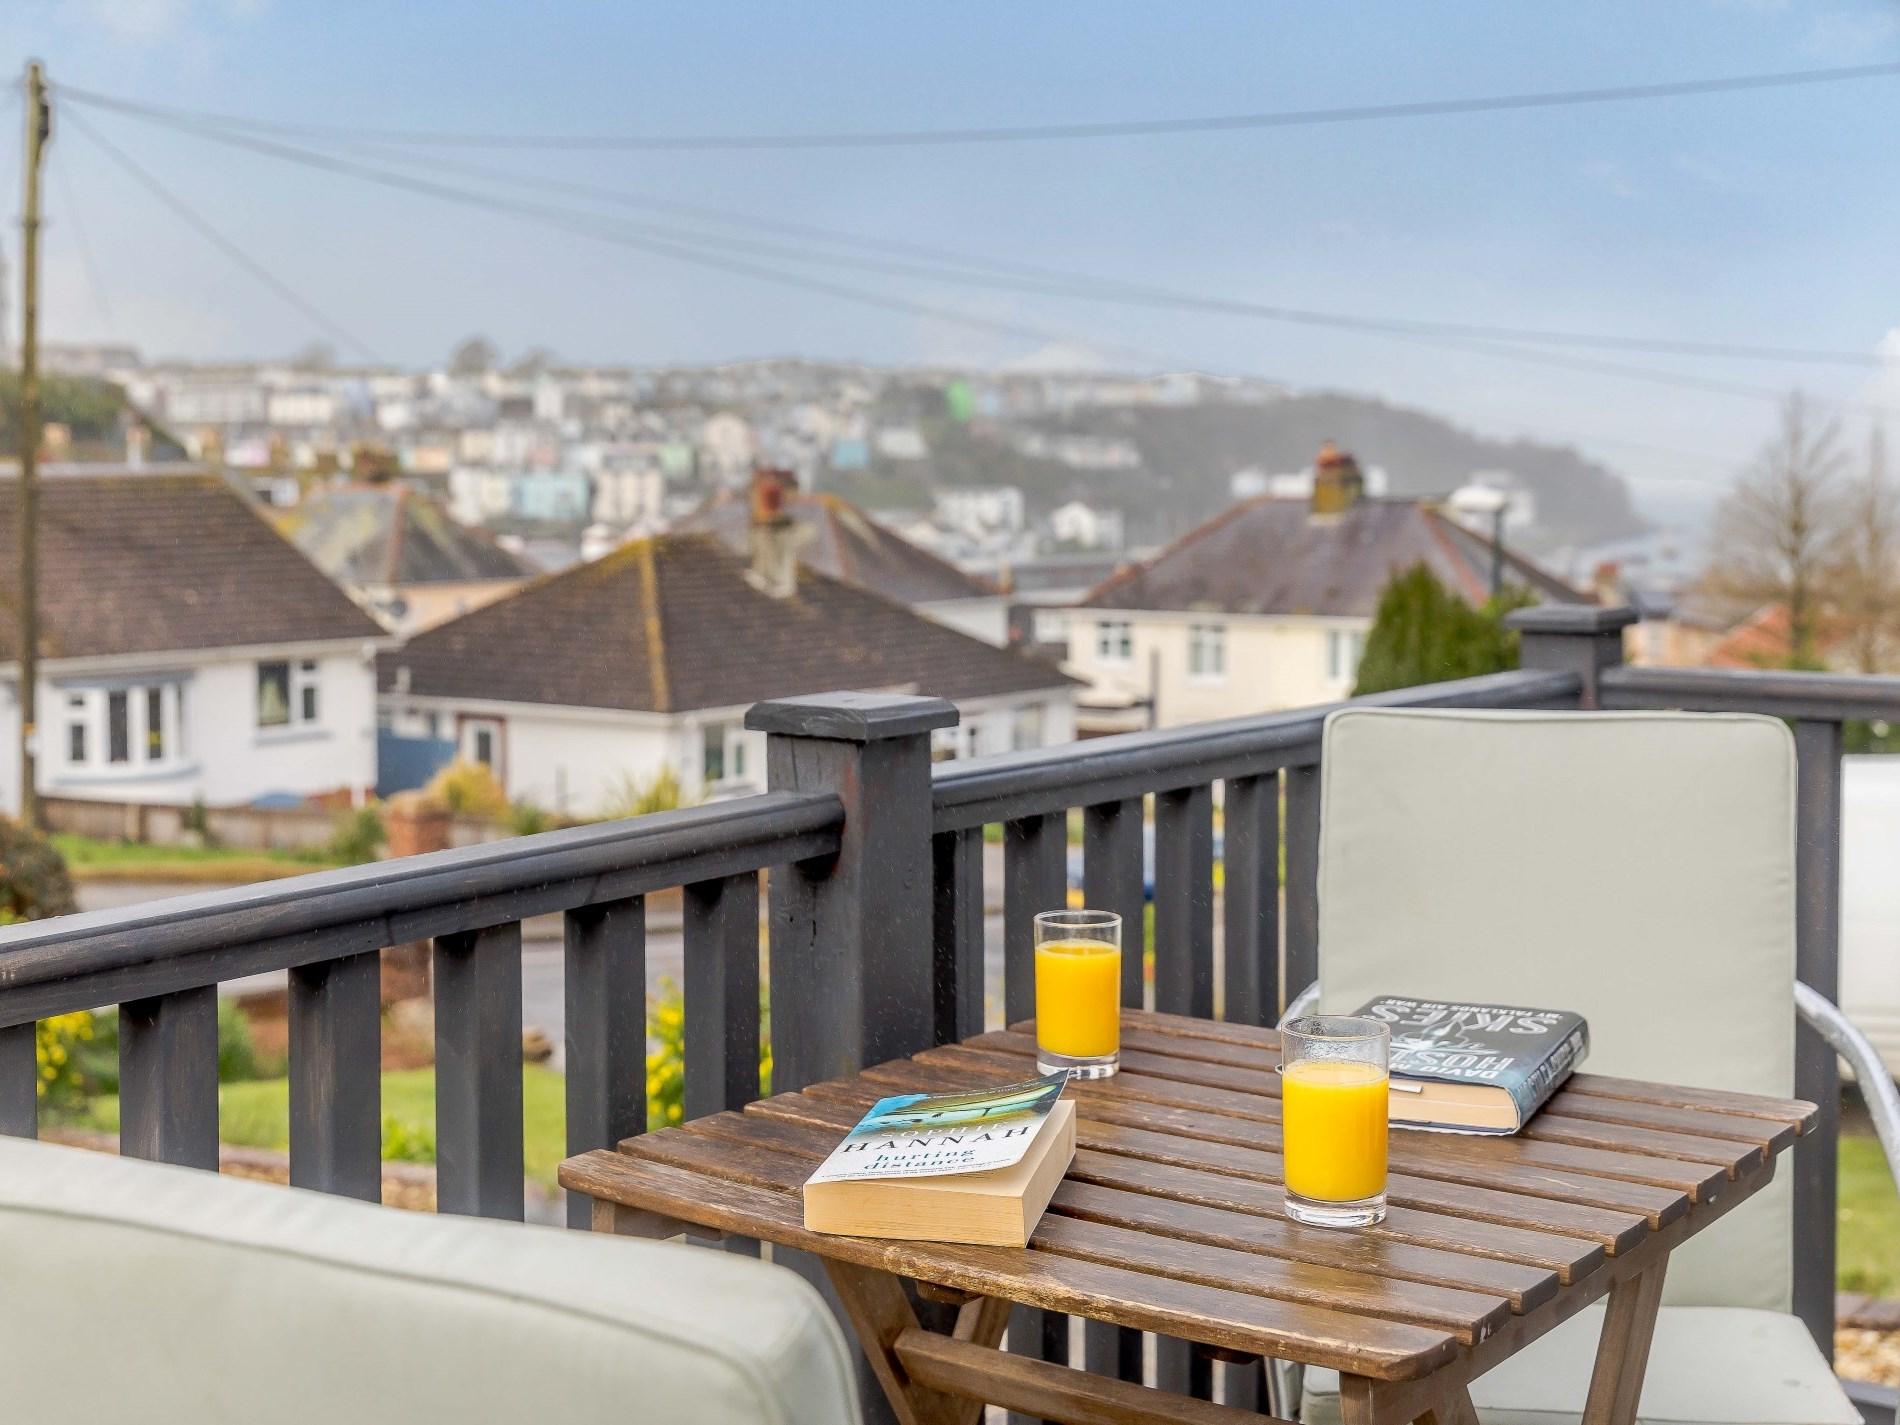 3 Bedroom House in South Devon, Devon